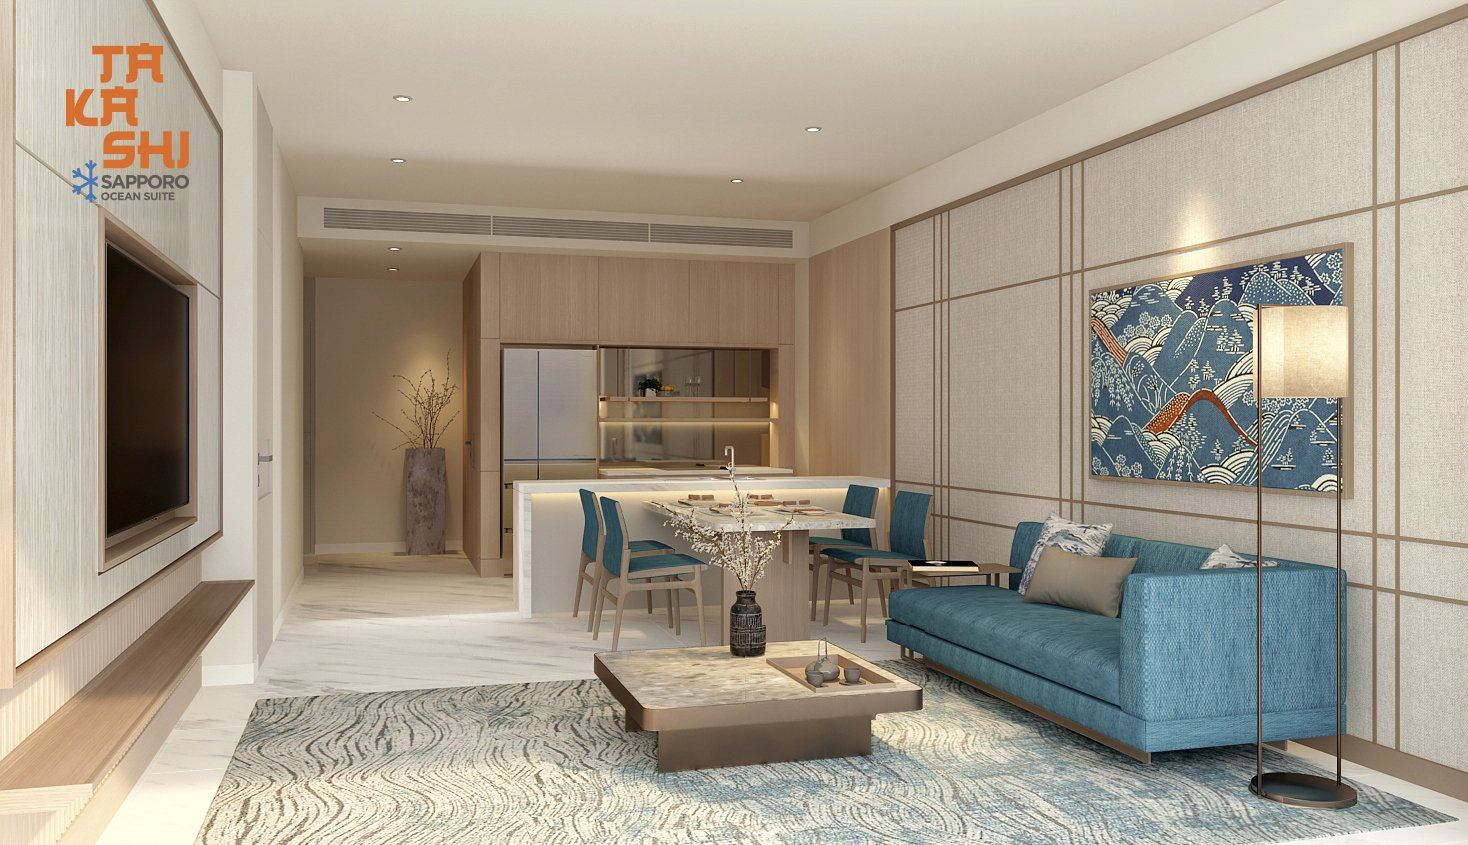 mau-can-ho-takashi-ocean-suite